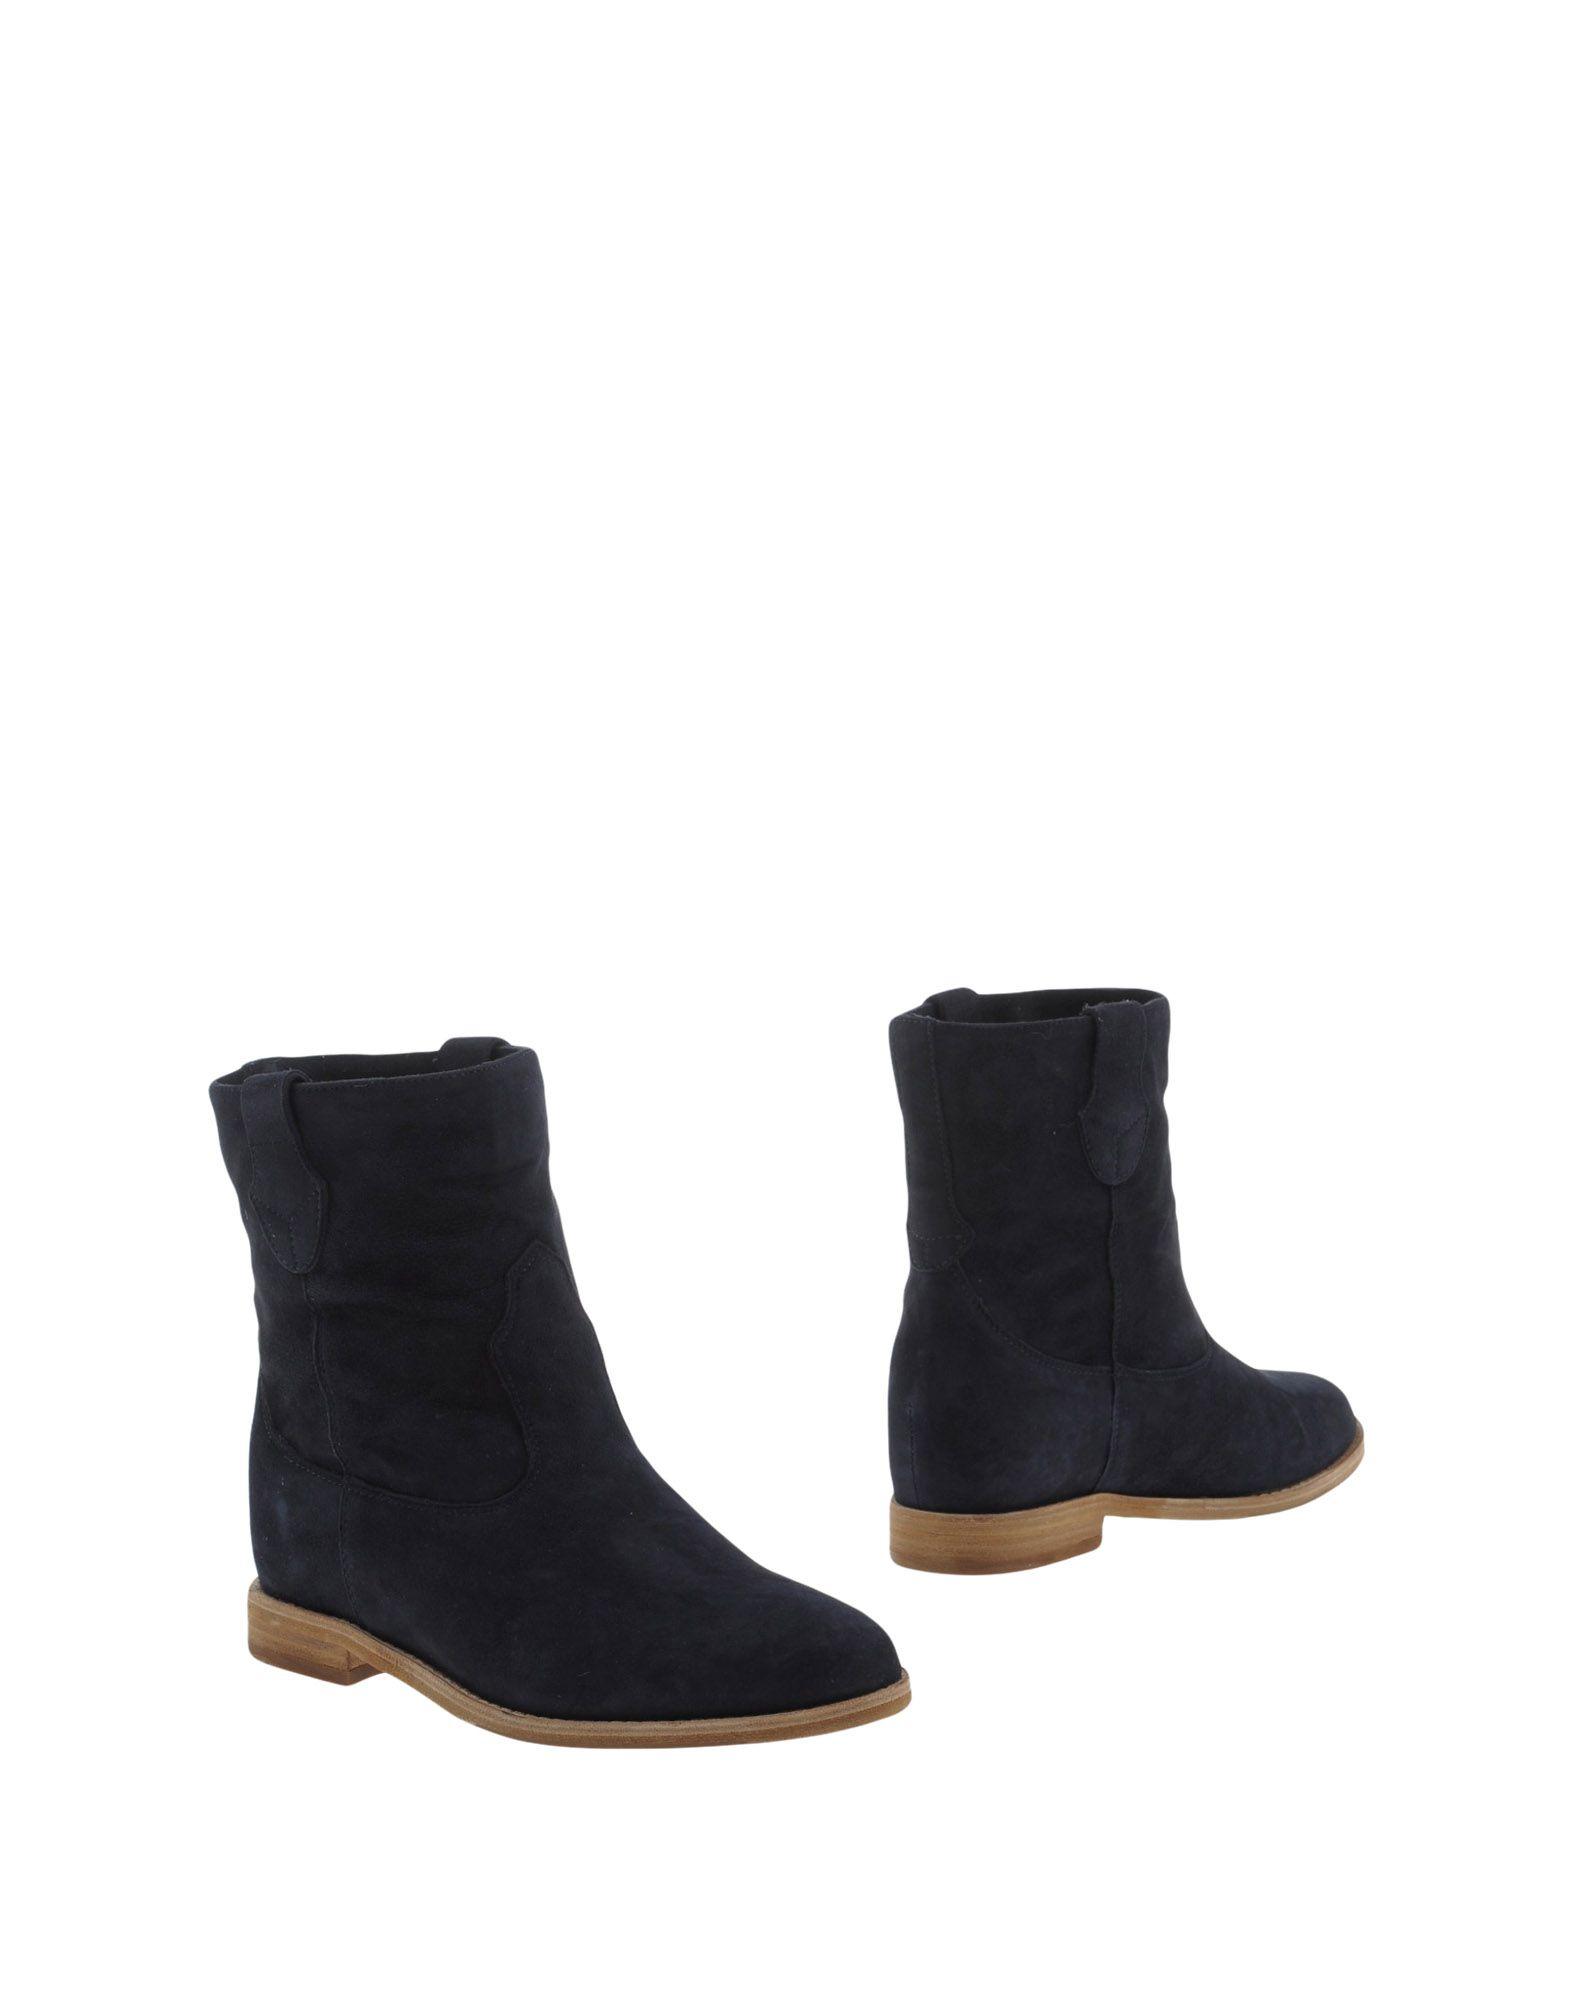 J|D Julie Dee Ankle Boot Boot Boot - Women J|D Julie Dee Ankle Boots online on  United Kingdom - 11354244UH 93bca9